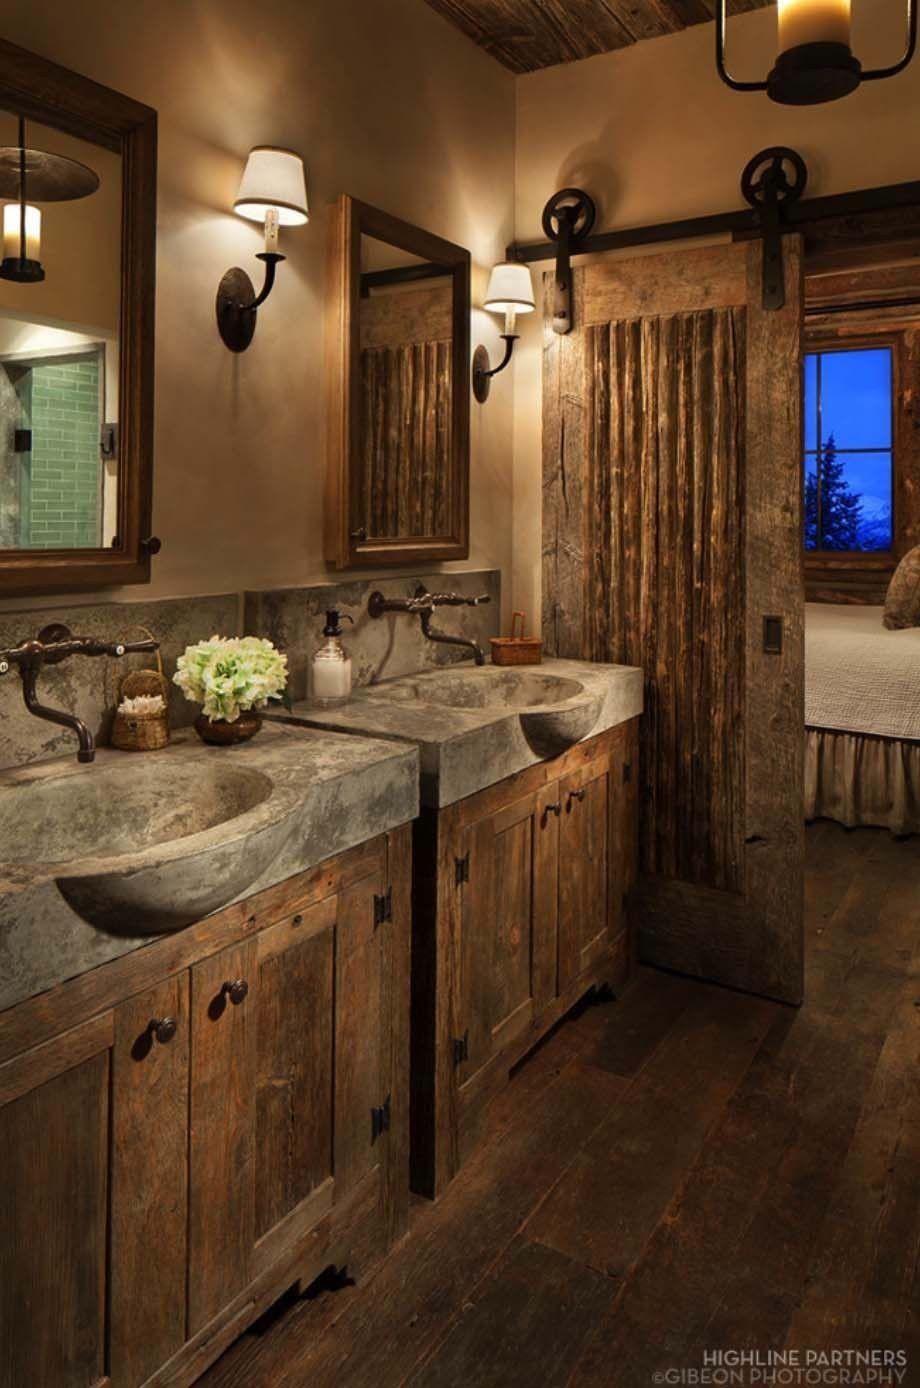 Image Result For Western Themed Bathroom Ideas Western Bathroom Decor All Things Western Rustic Bathroom Remodel Rustic Bathroom Decor Bathroom Vanity Remodel